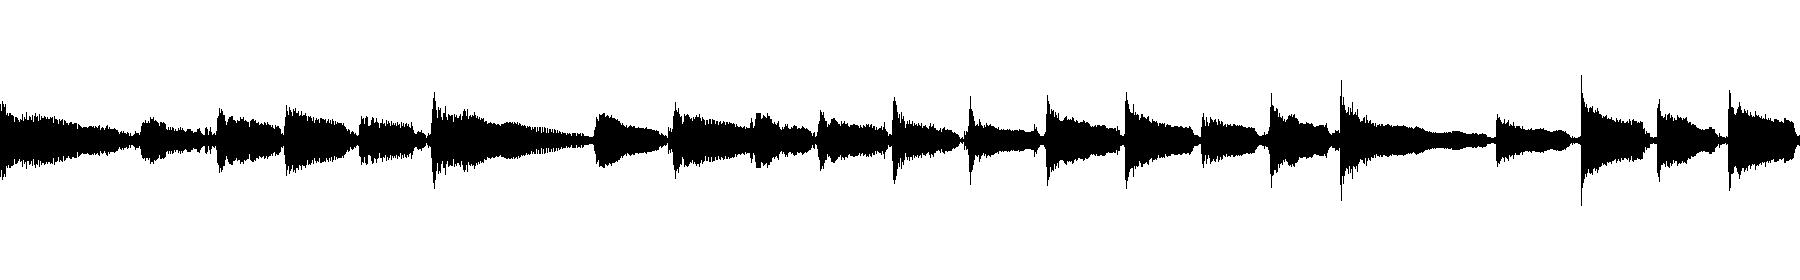 fl bluesguitar acoustic licks 78bpm f 26